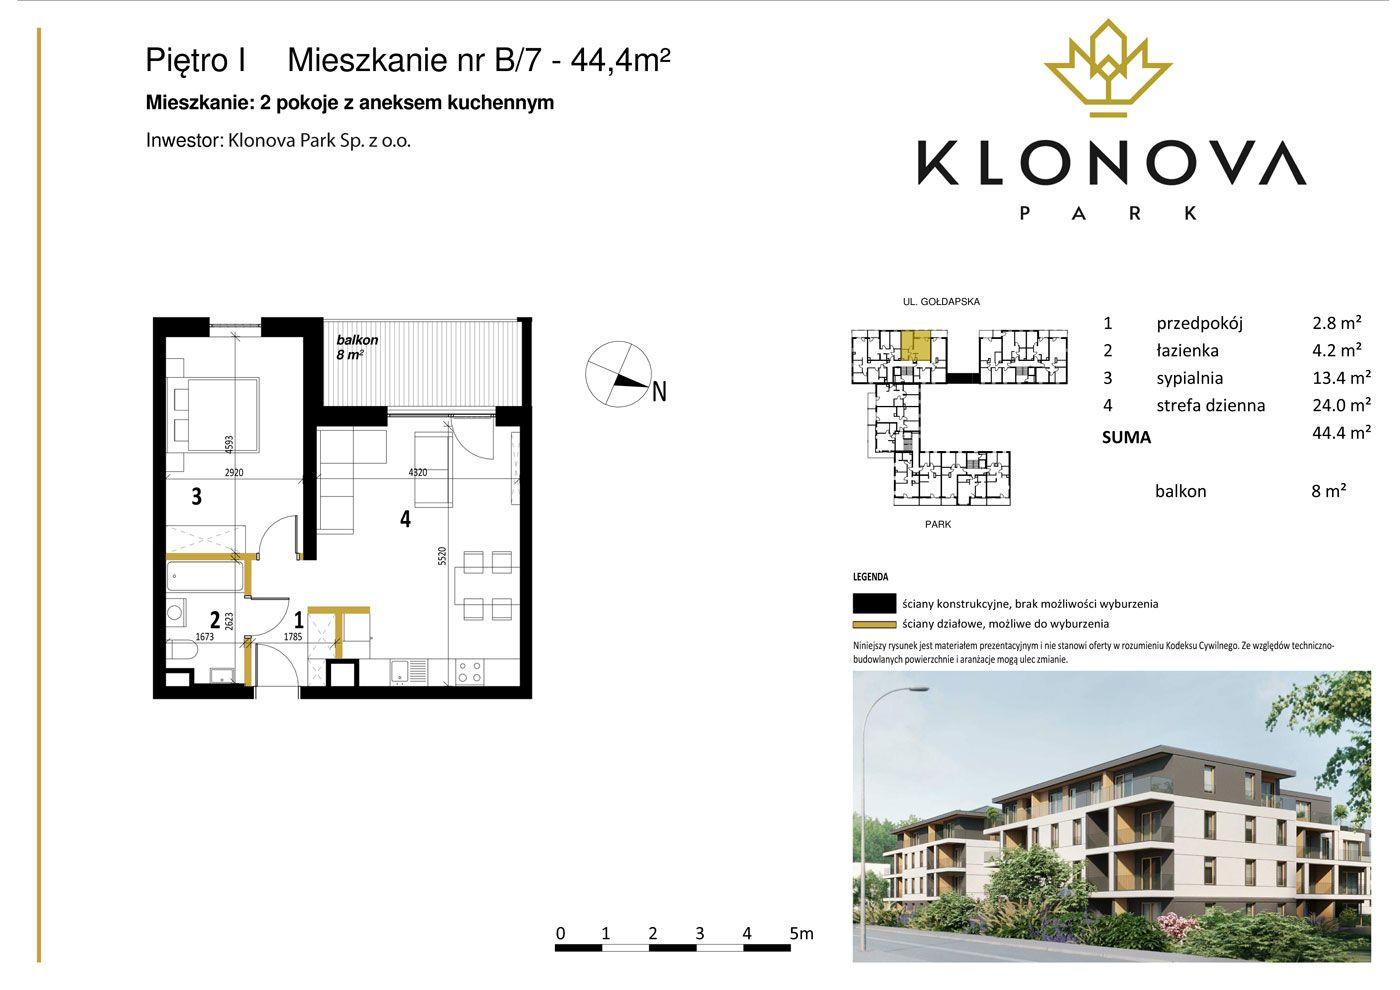 Apartamenty Klonova Park - Plan mieszkania B/7